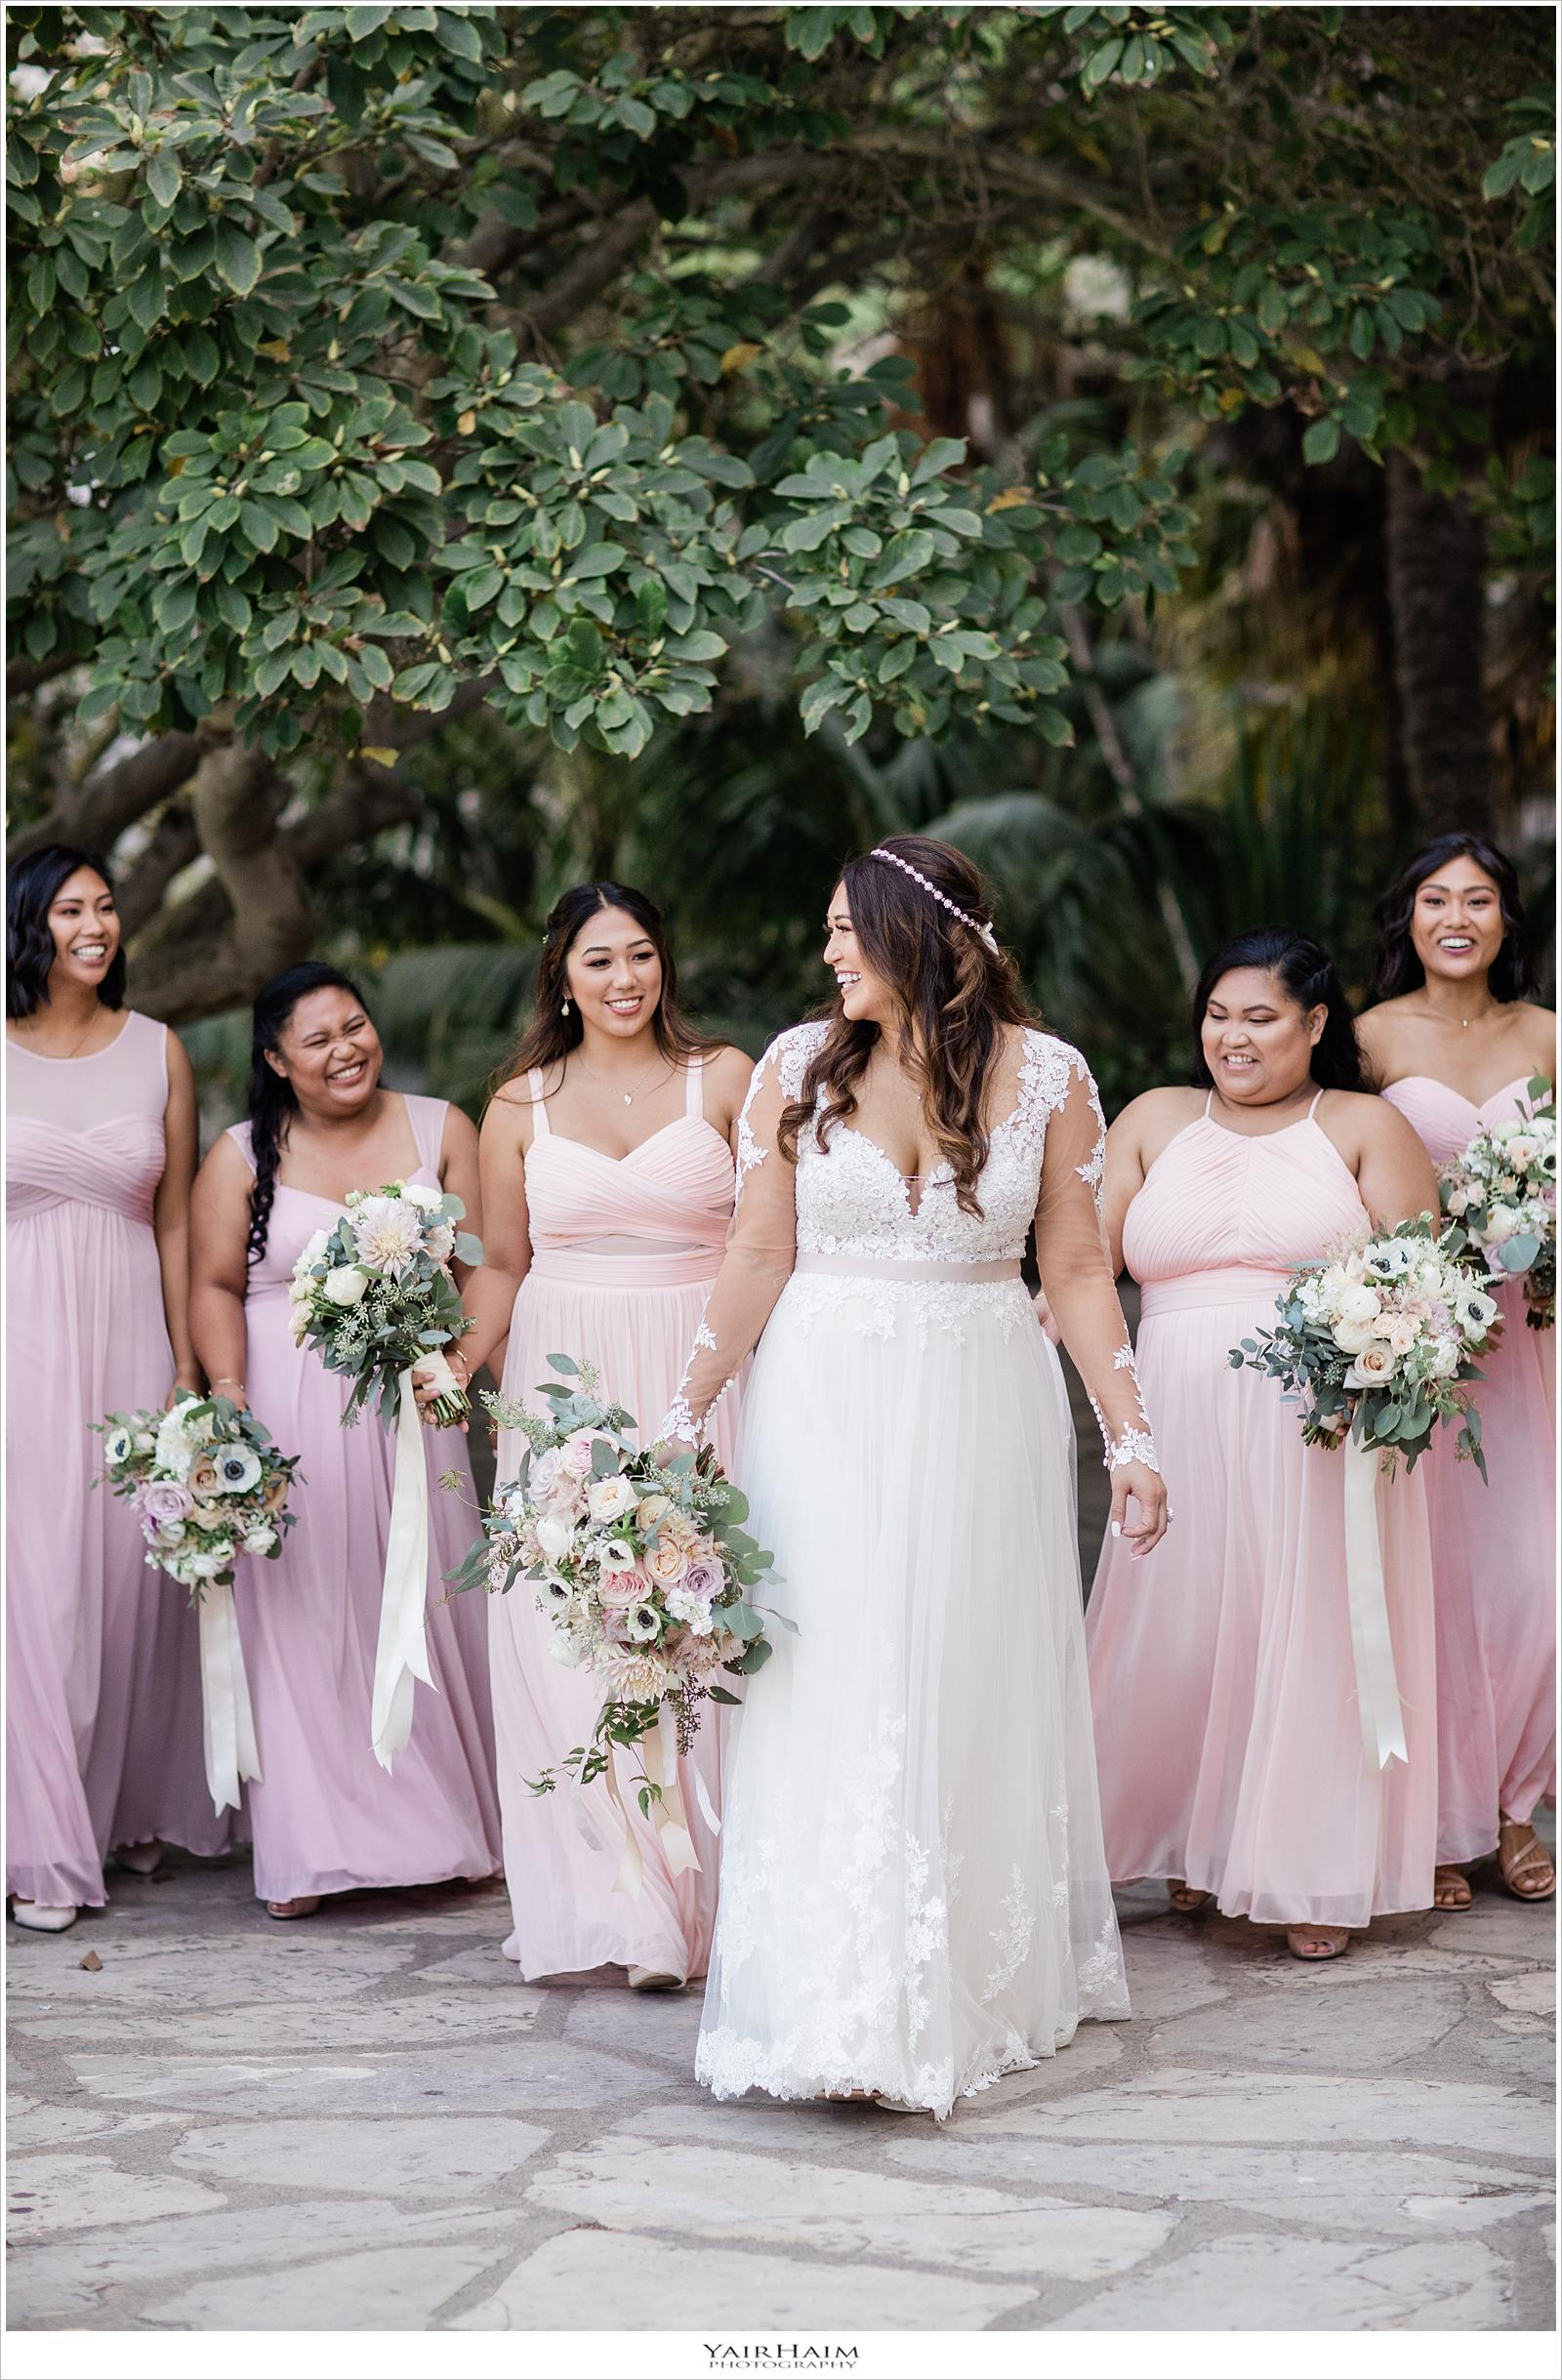 Chrystle-Robbie-wedding-photos-175.JPG